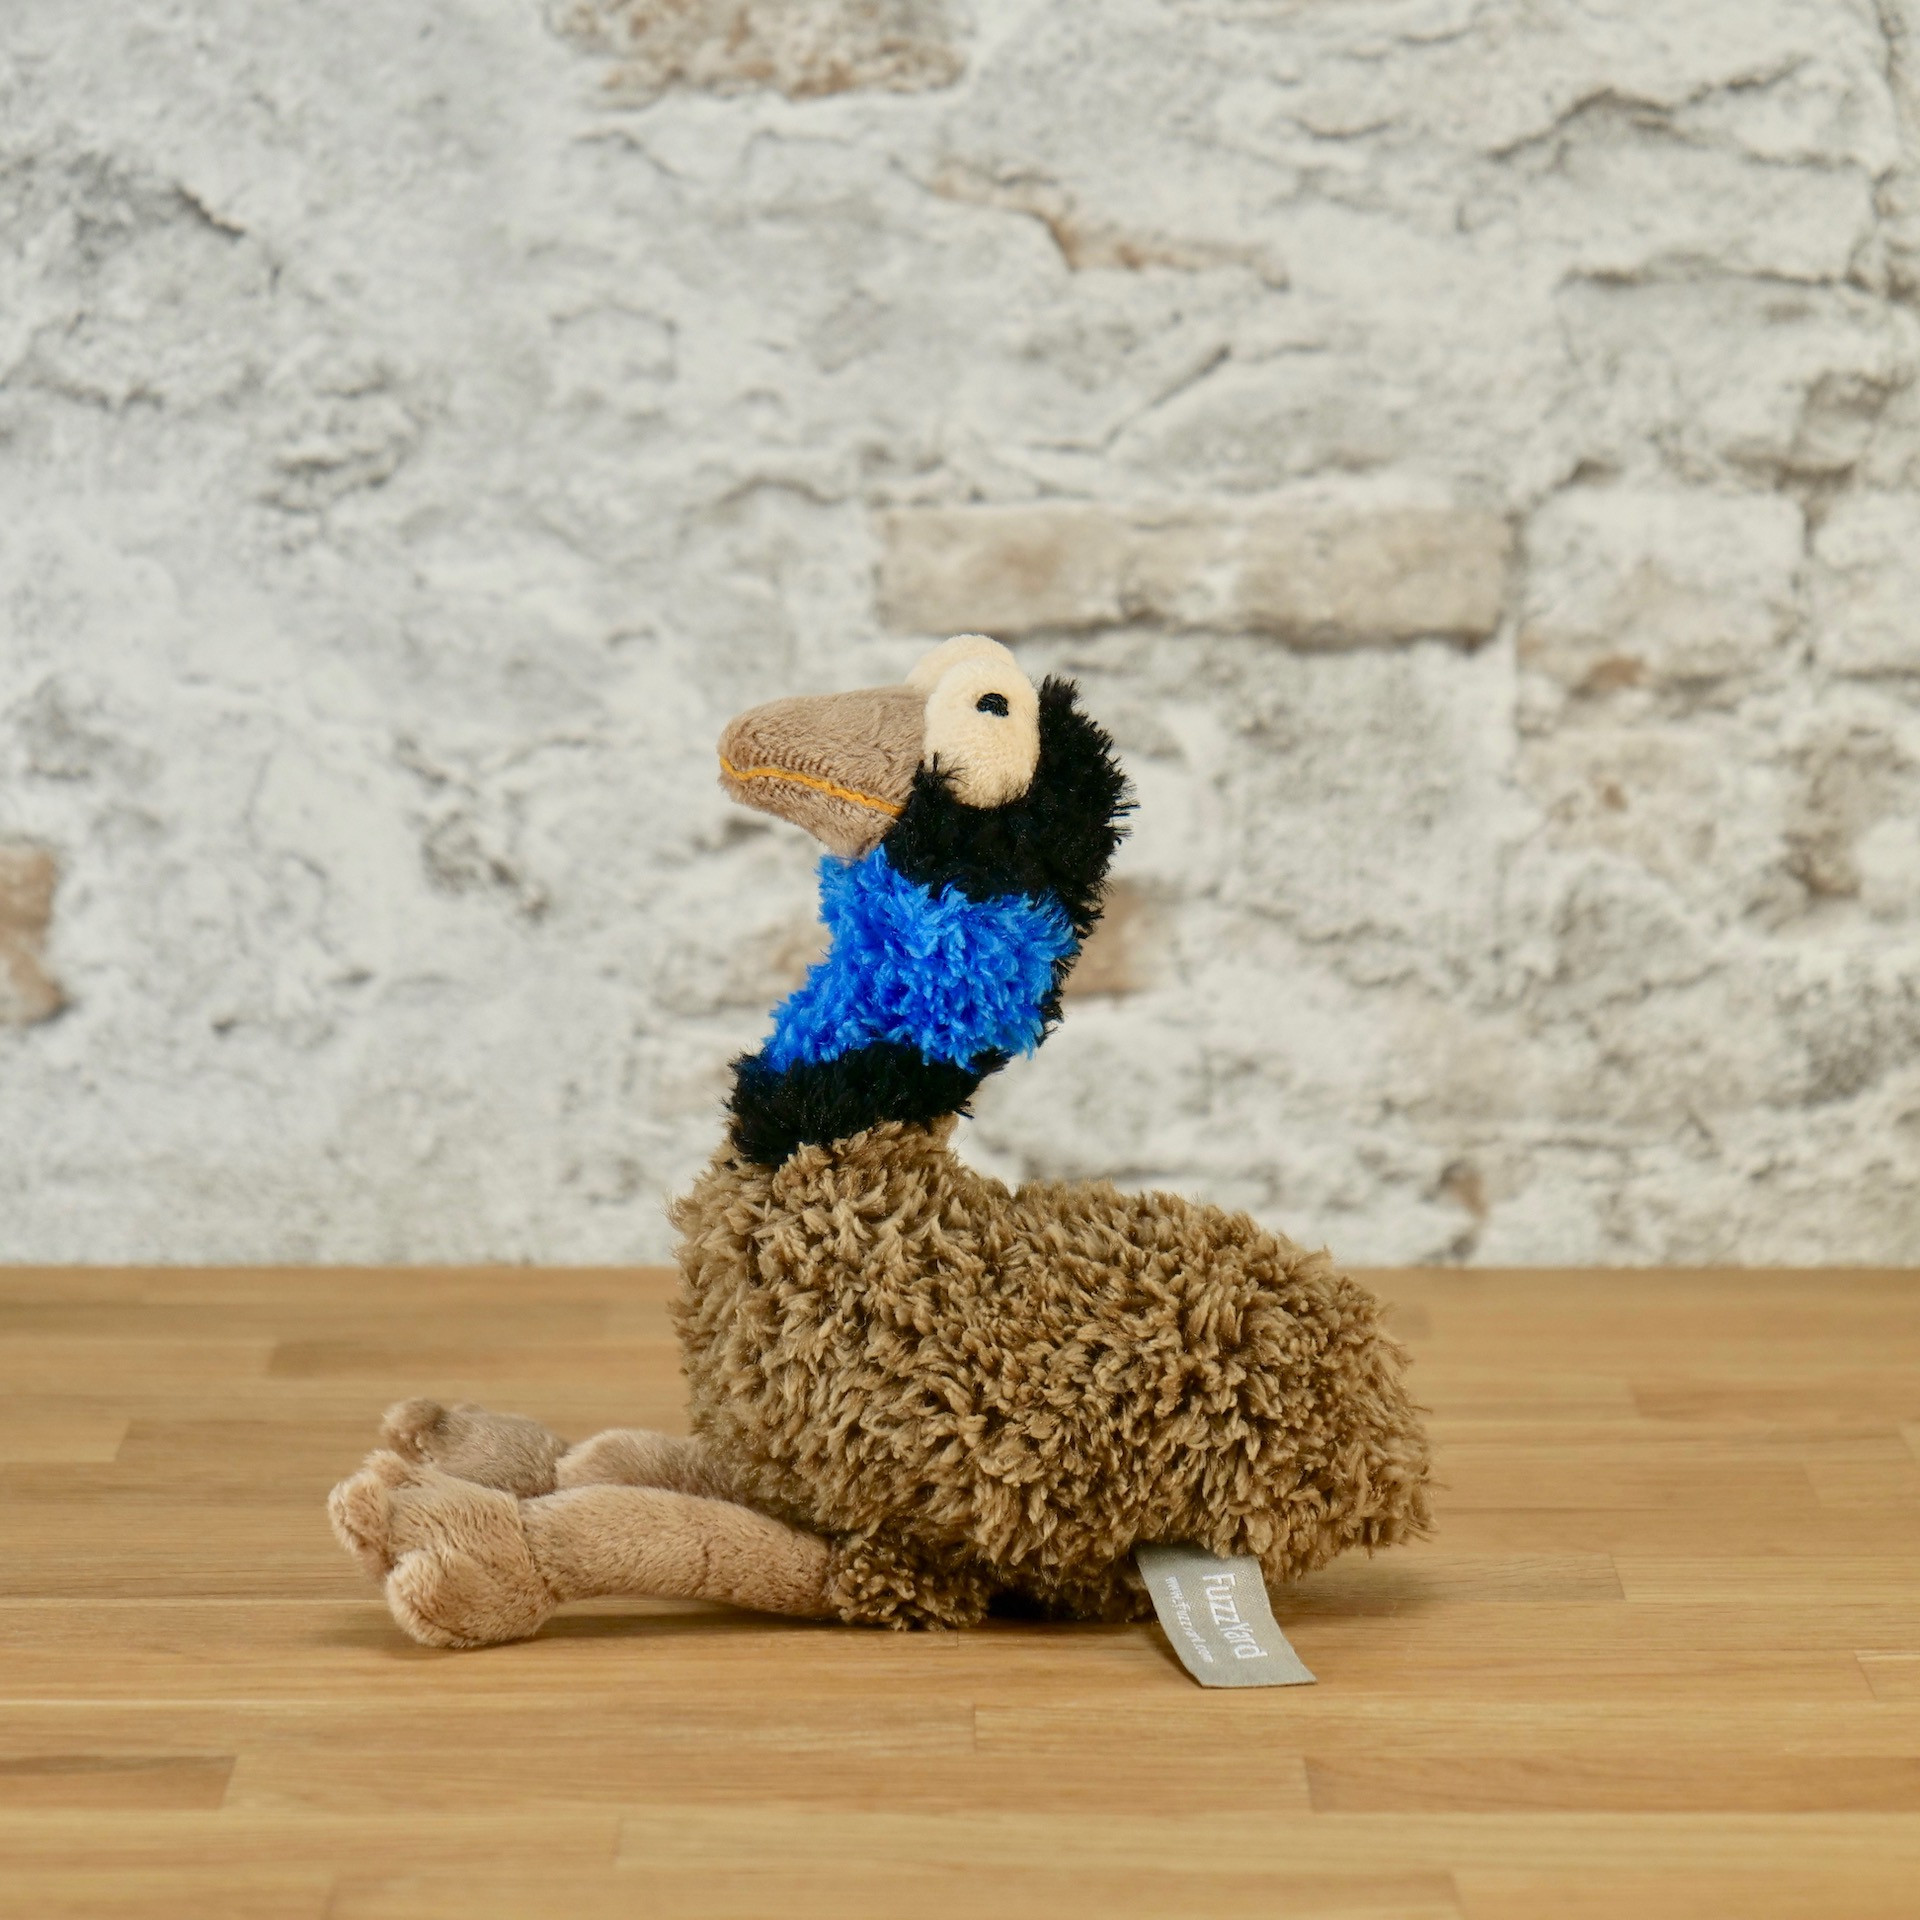 Hundespielzeug Oz, der Emu